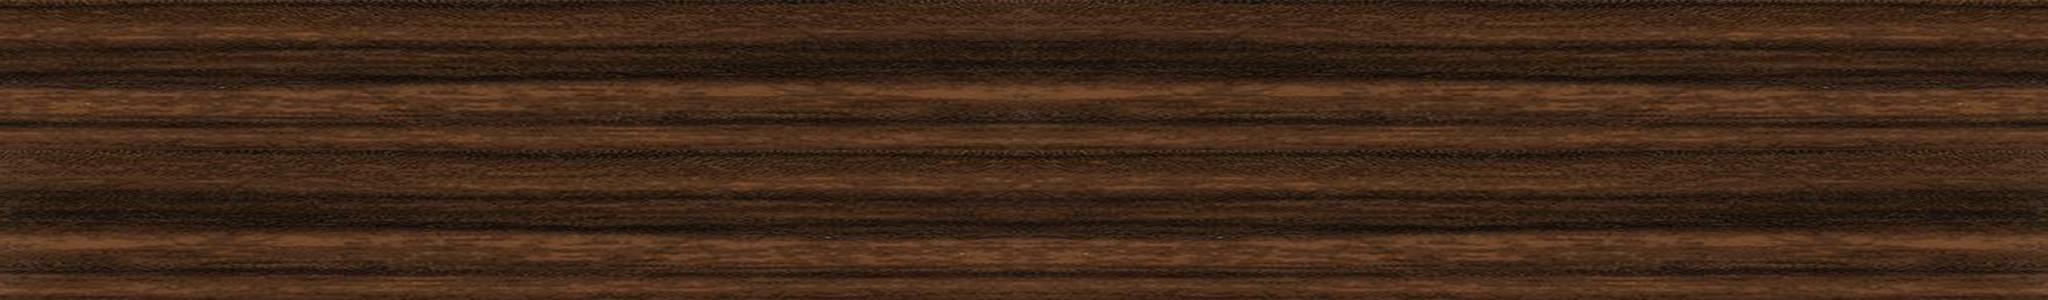 HD 280010 ABS hrana ořech americký hladký lesk 90°